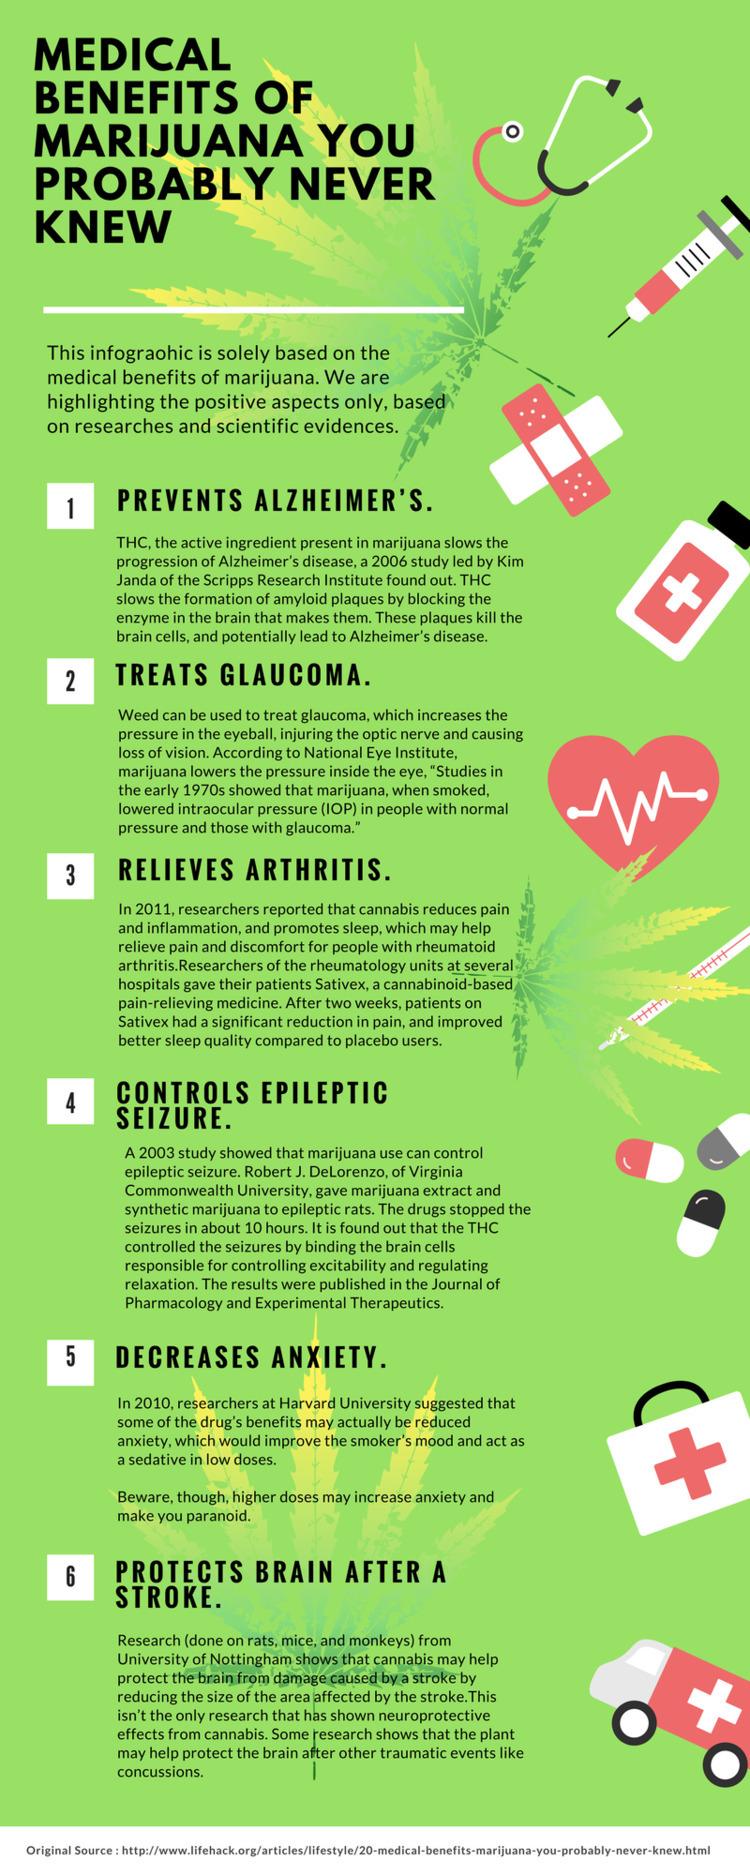 Medical Benefits Marijuana Knew - pufflandcanada   ello